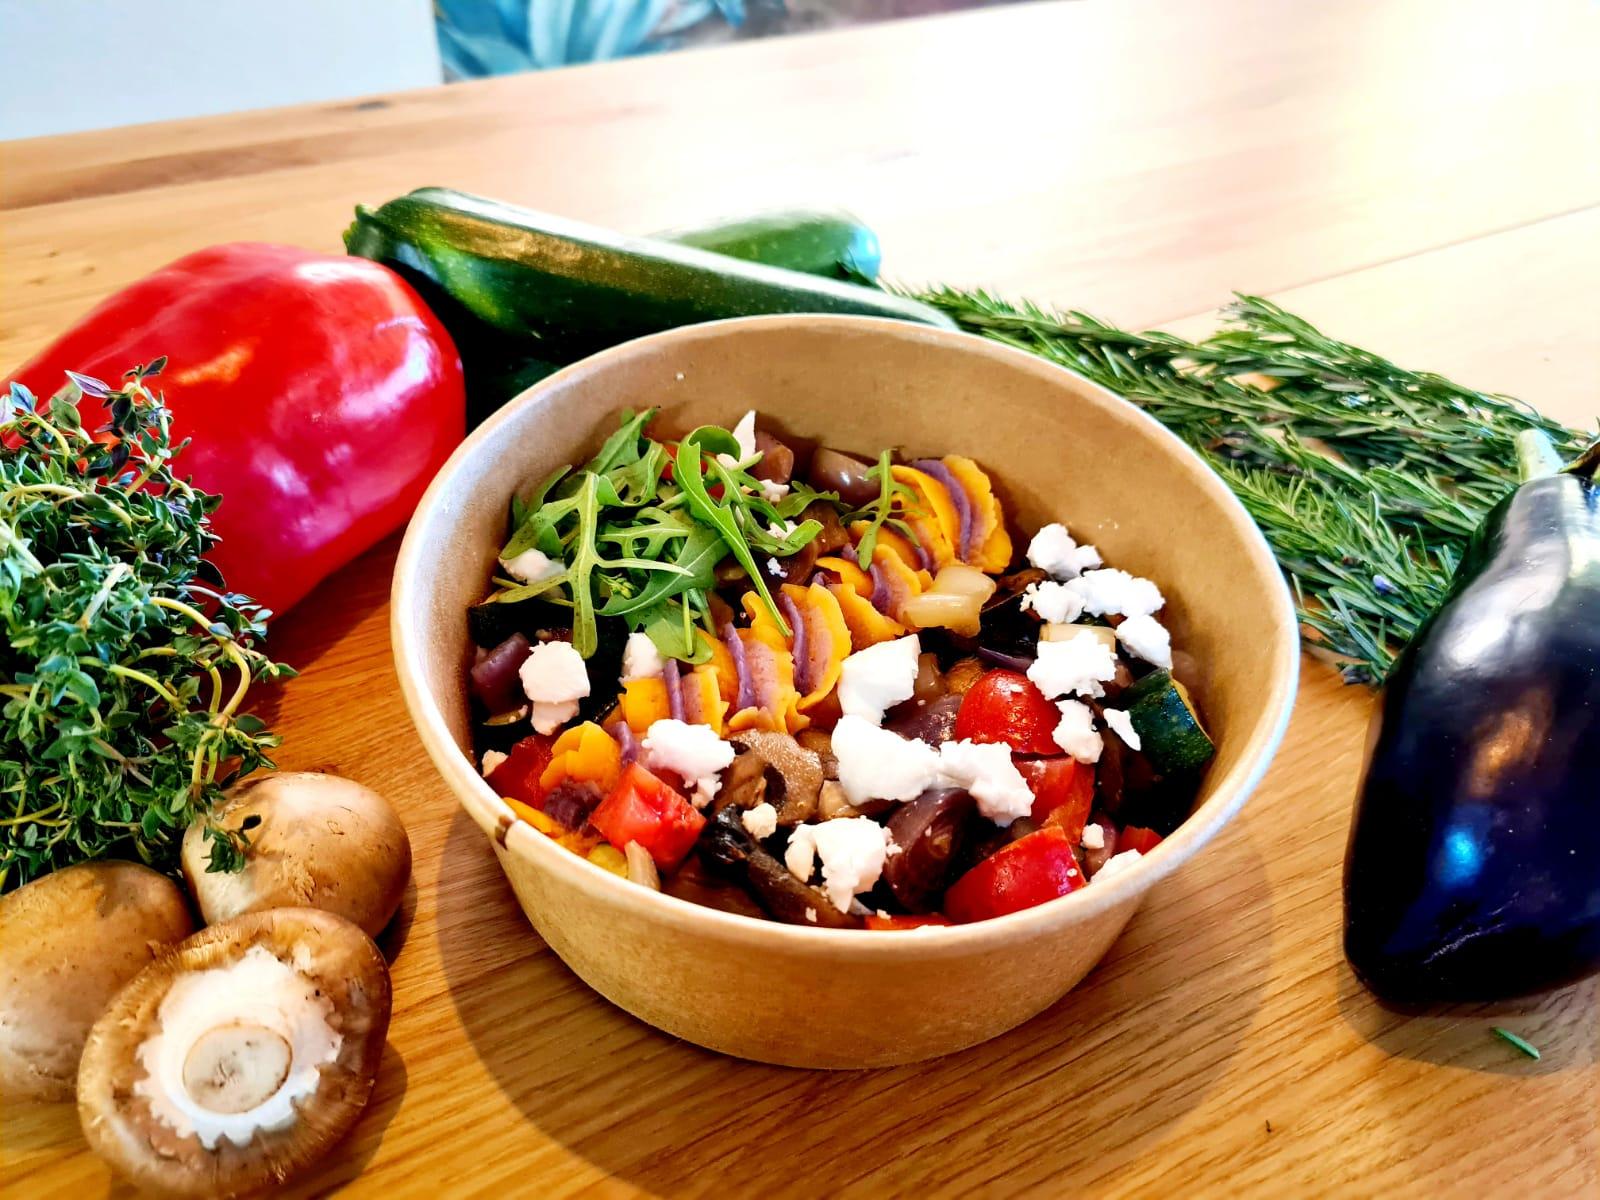 Mediterranes Gemüse mit veganem Feta und Süsskartoffelpuree